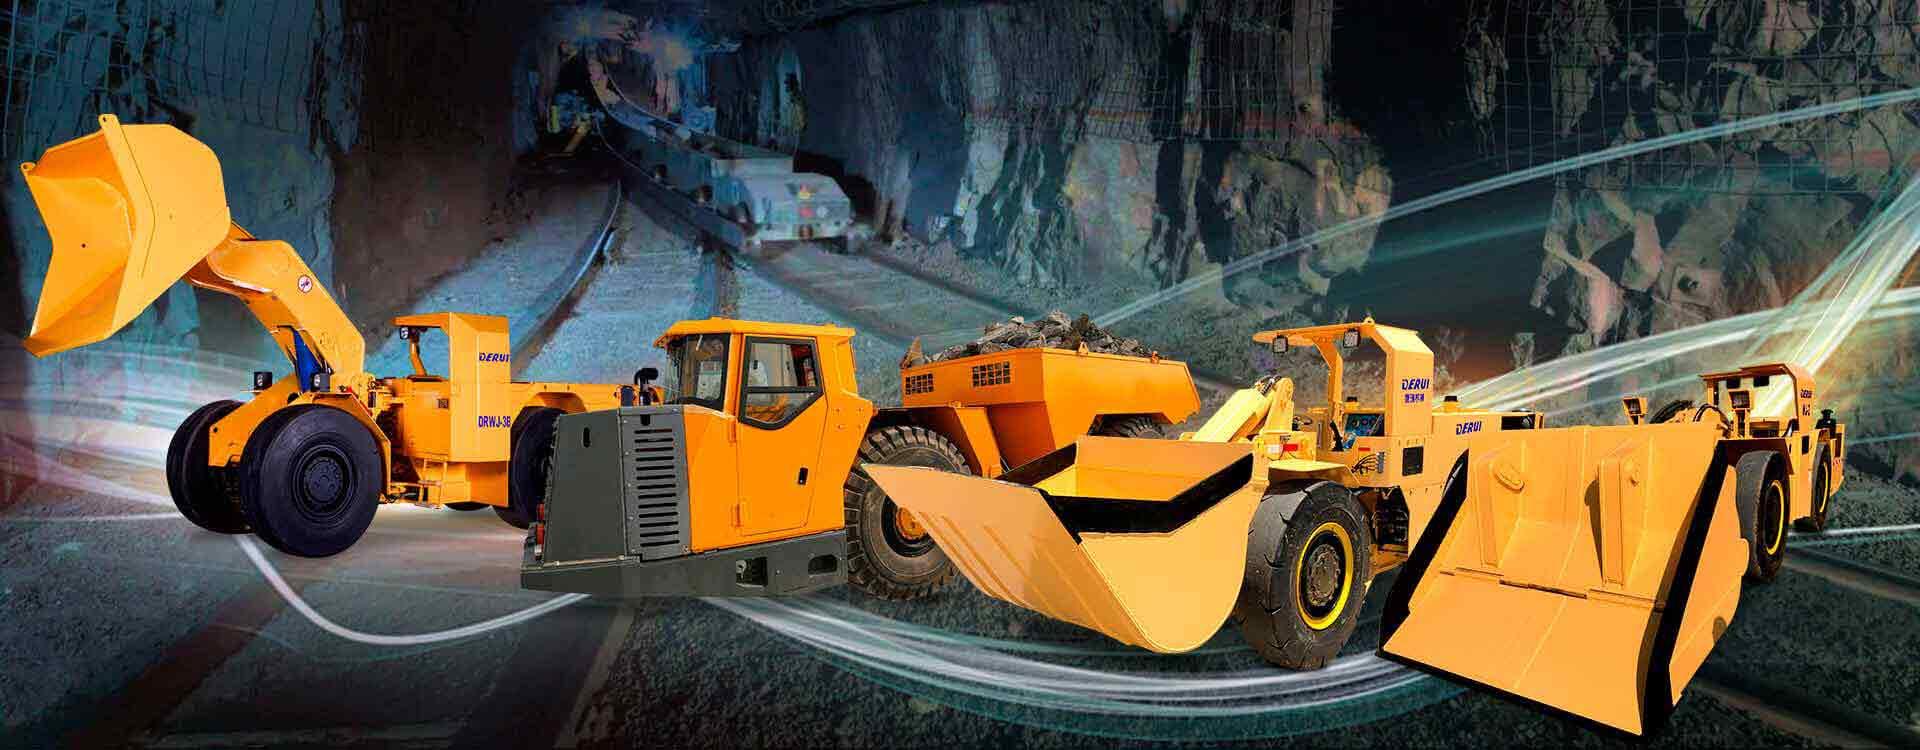 Underground Drilling Rigs